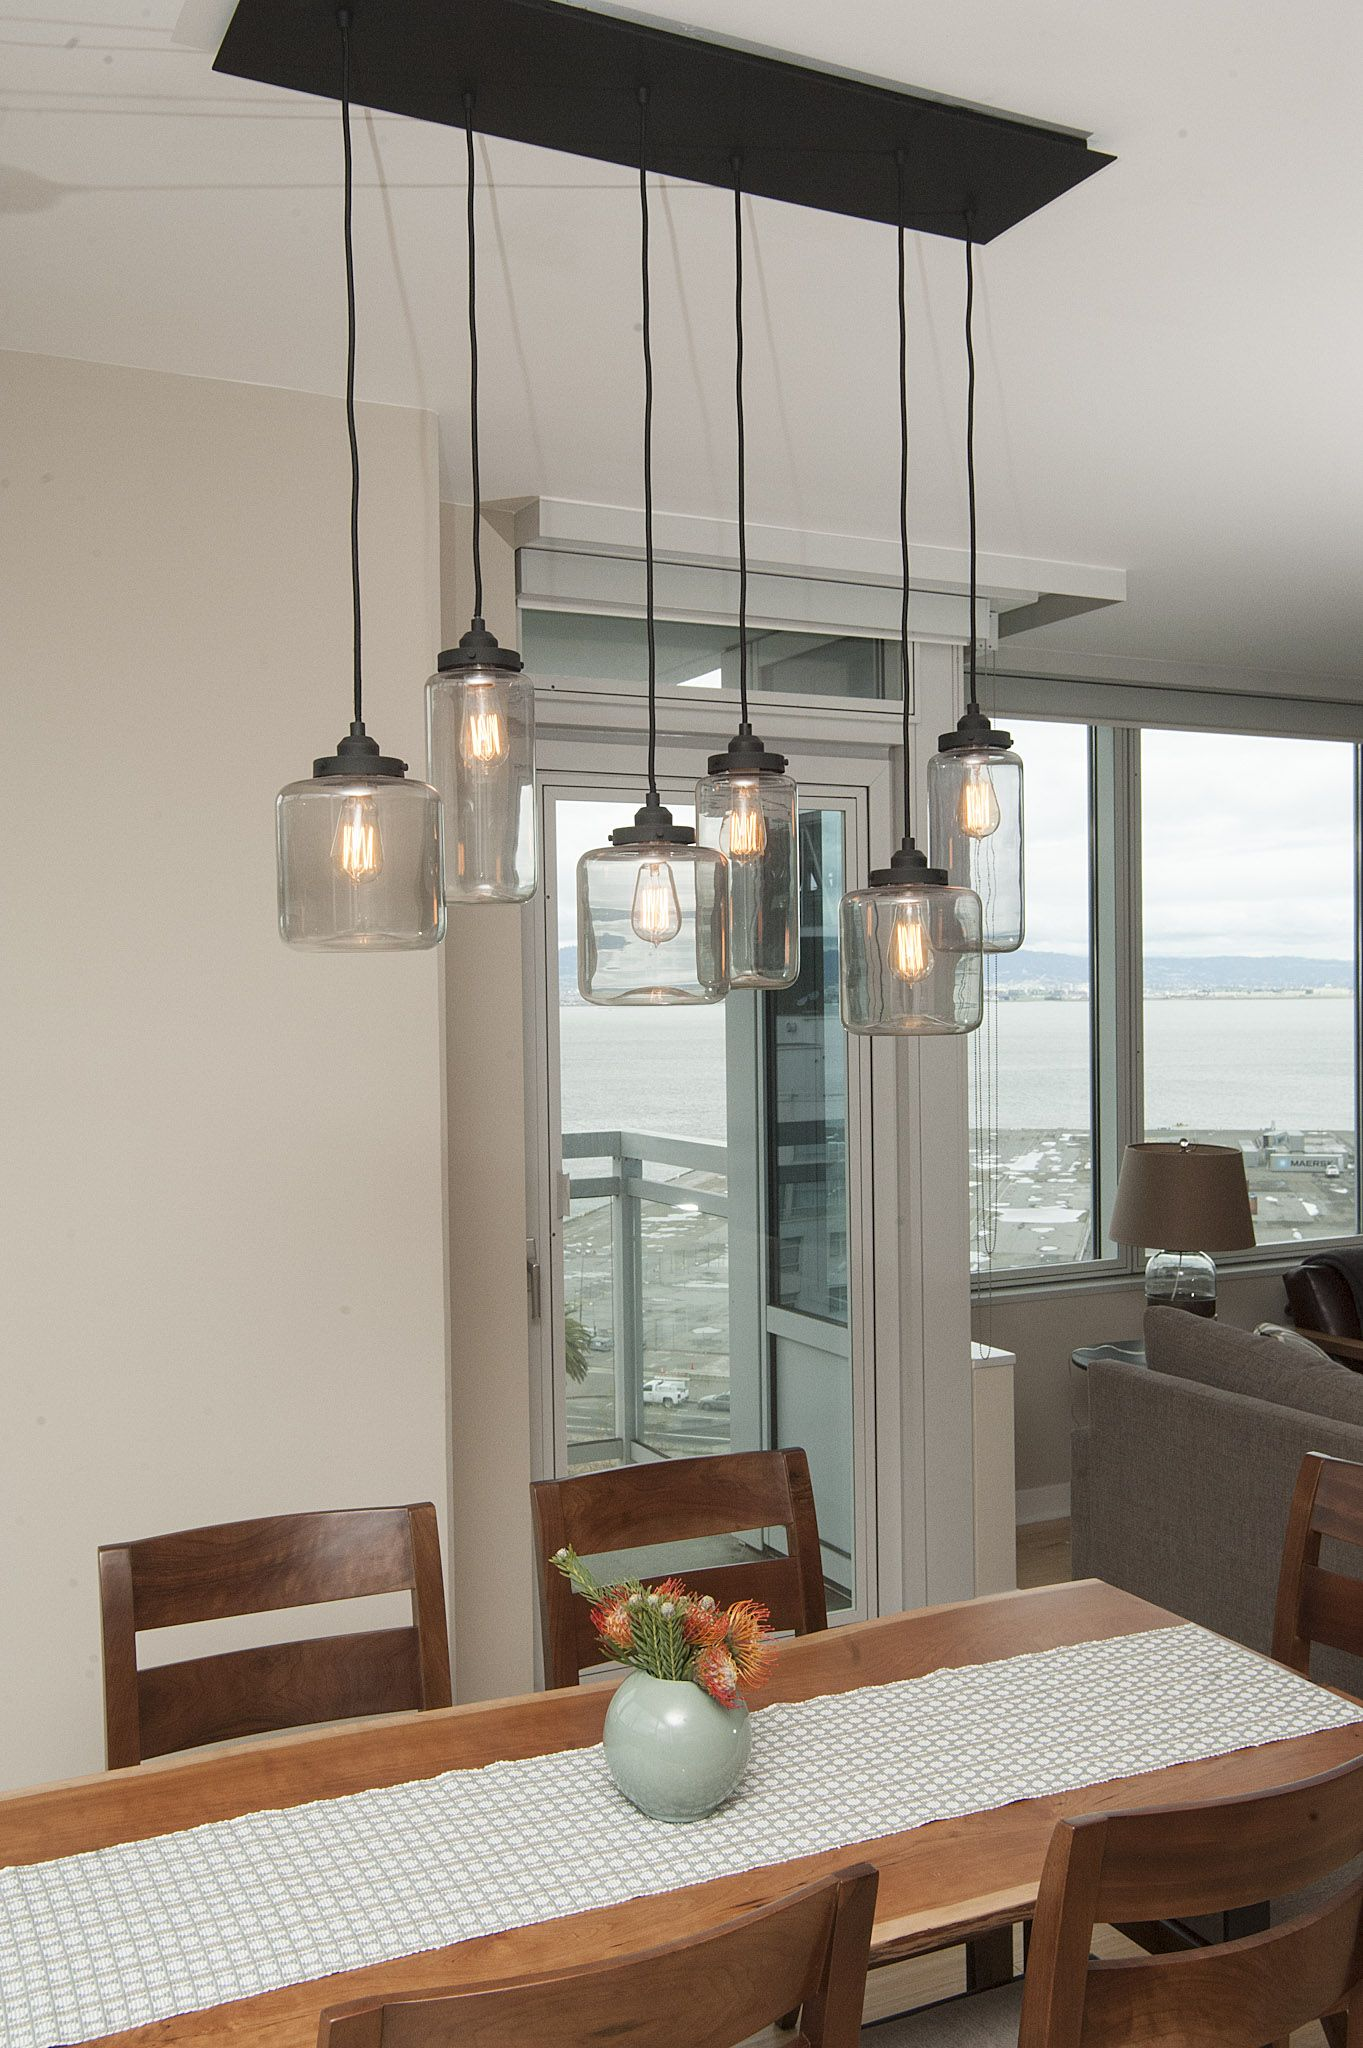 Kitchen Table Light Fixture Cabinet Cleaner Recipe Mason Jar Jill Cordner Interior Design Dt